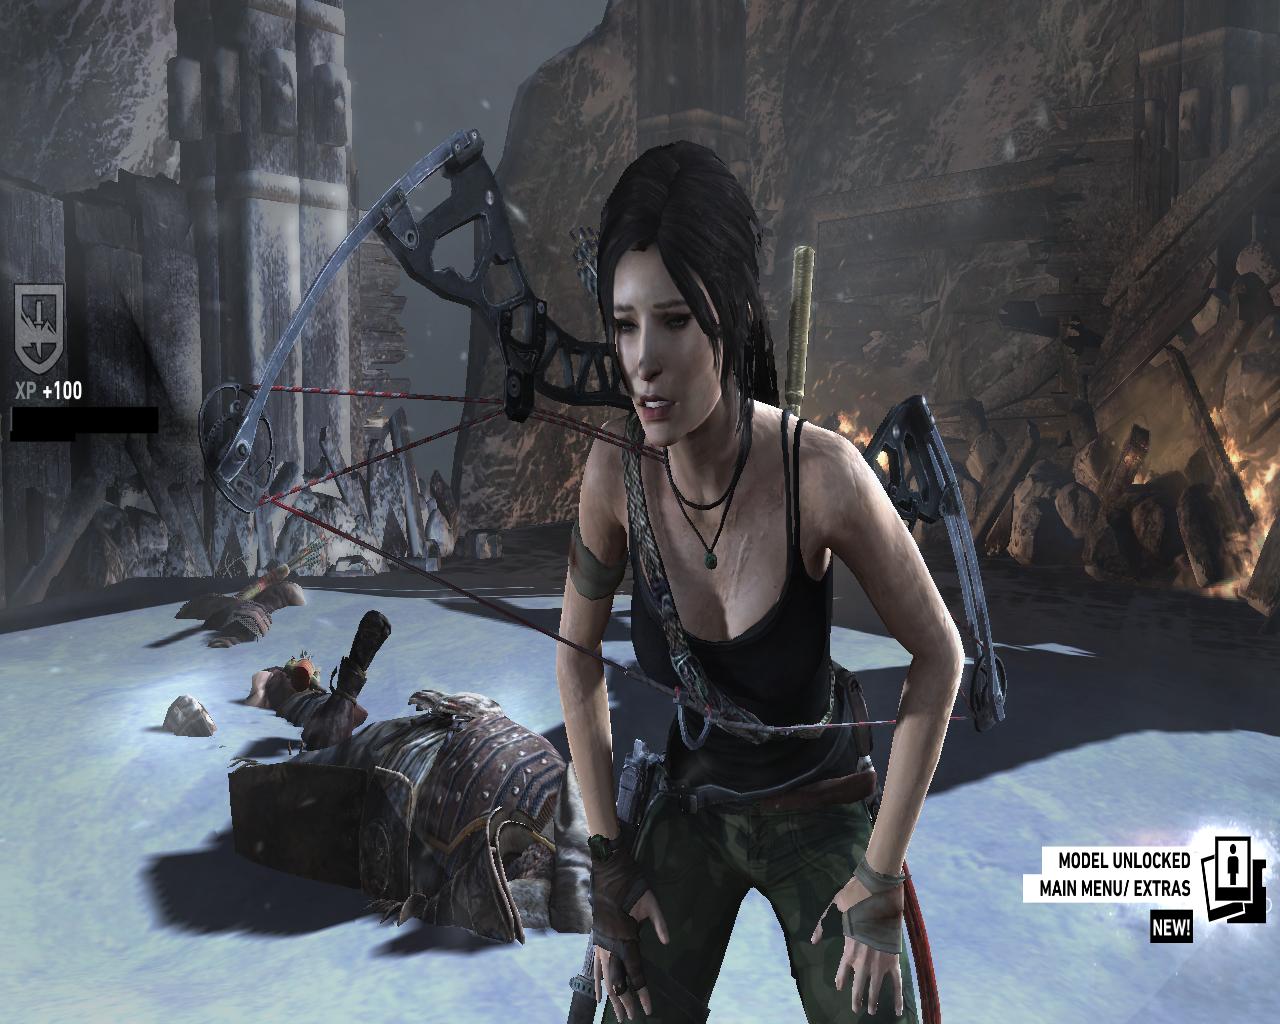 Tomb Raider 2013 Underworld Jungle Shorts Grey Outfit Mod